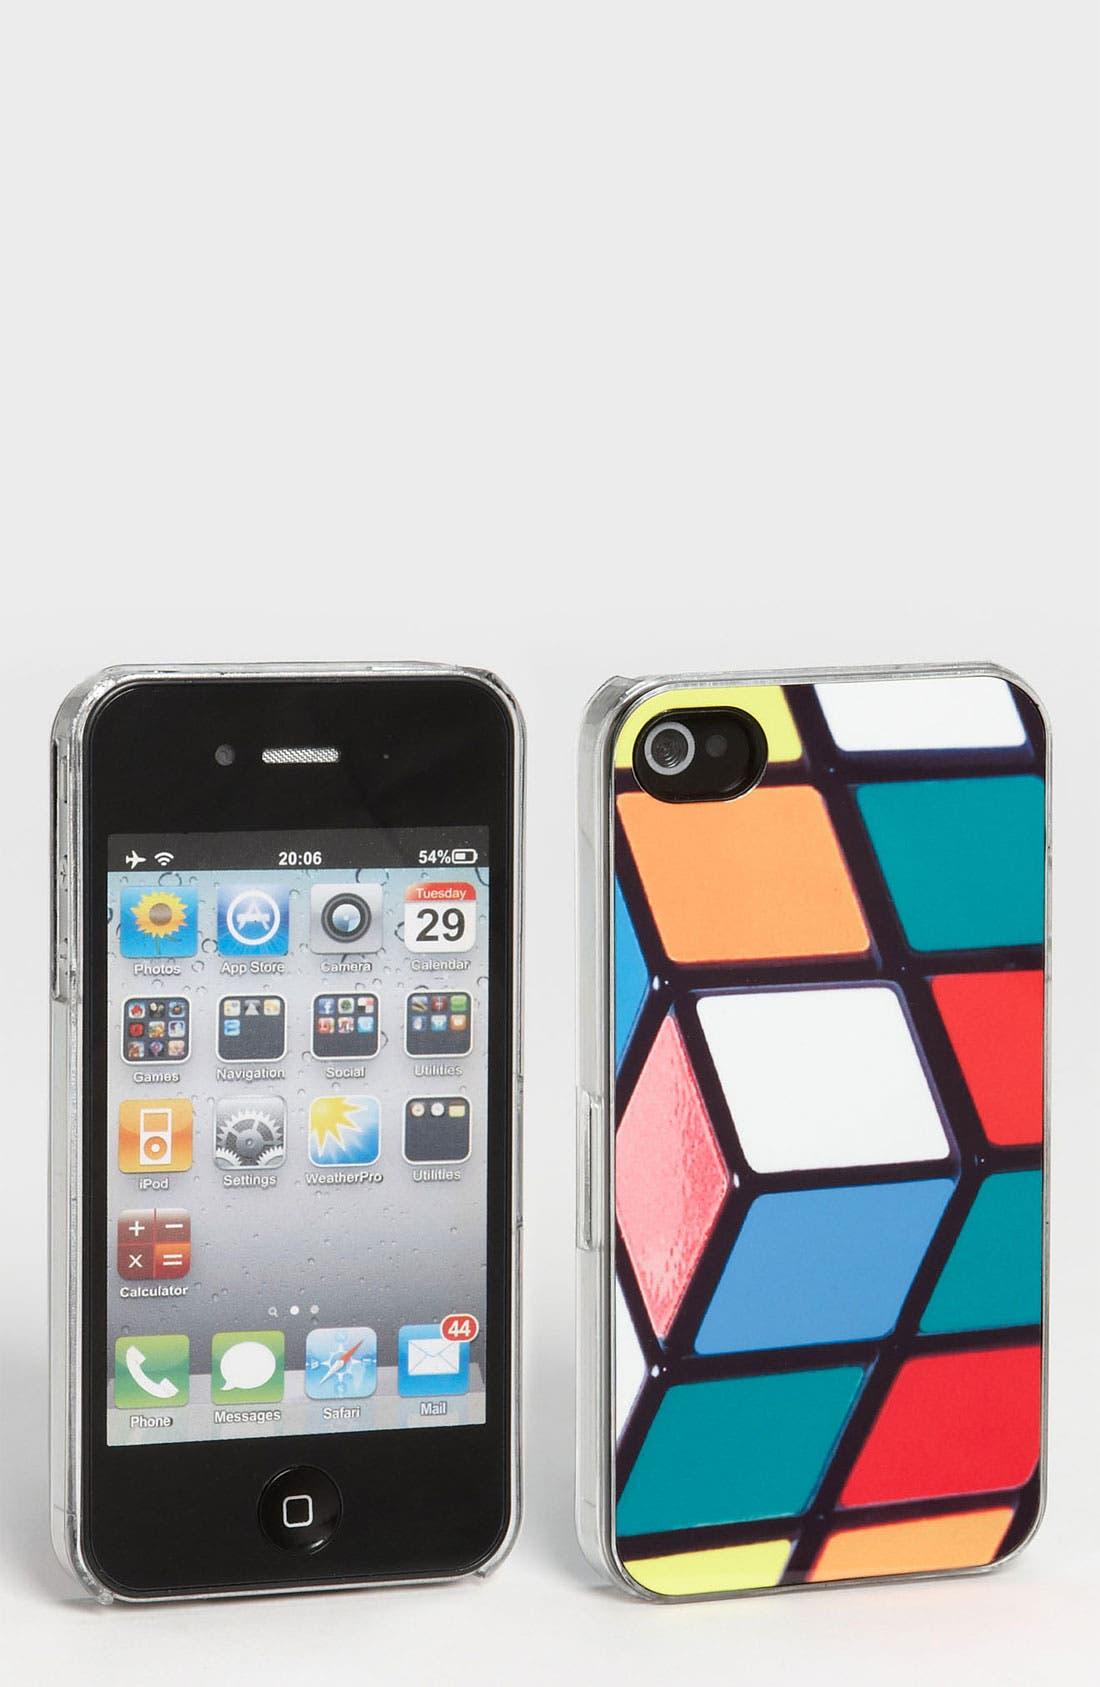 Main Image - ZERO GRAVITY 'Puzzled' iPhone 4 & 4S Case